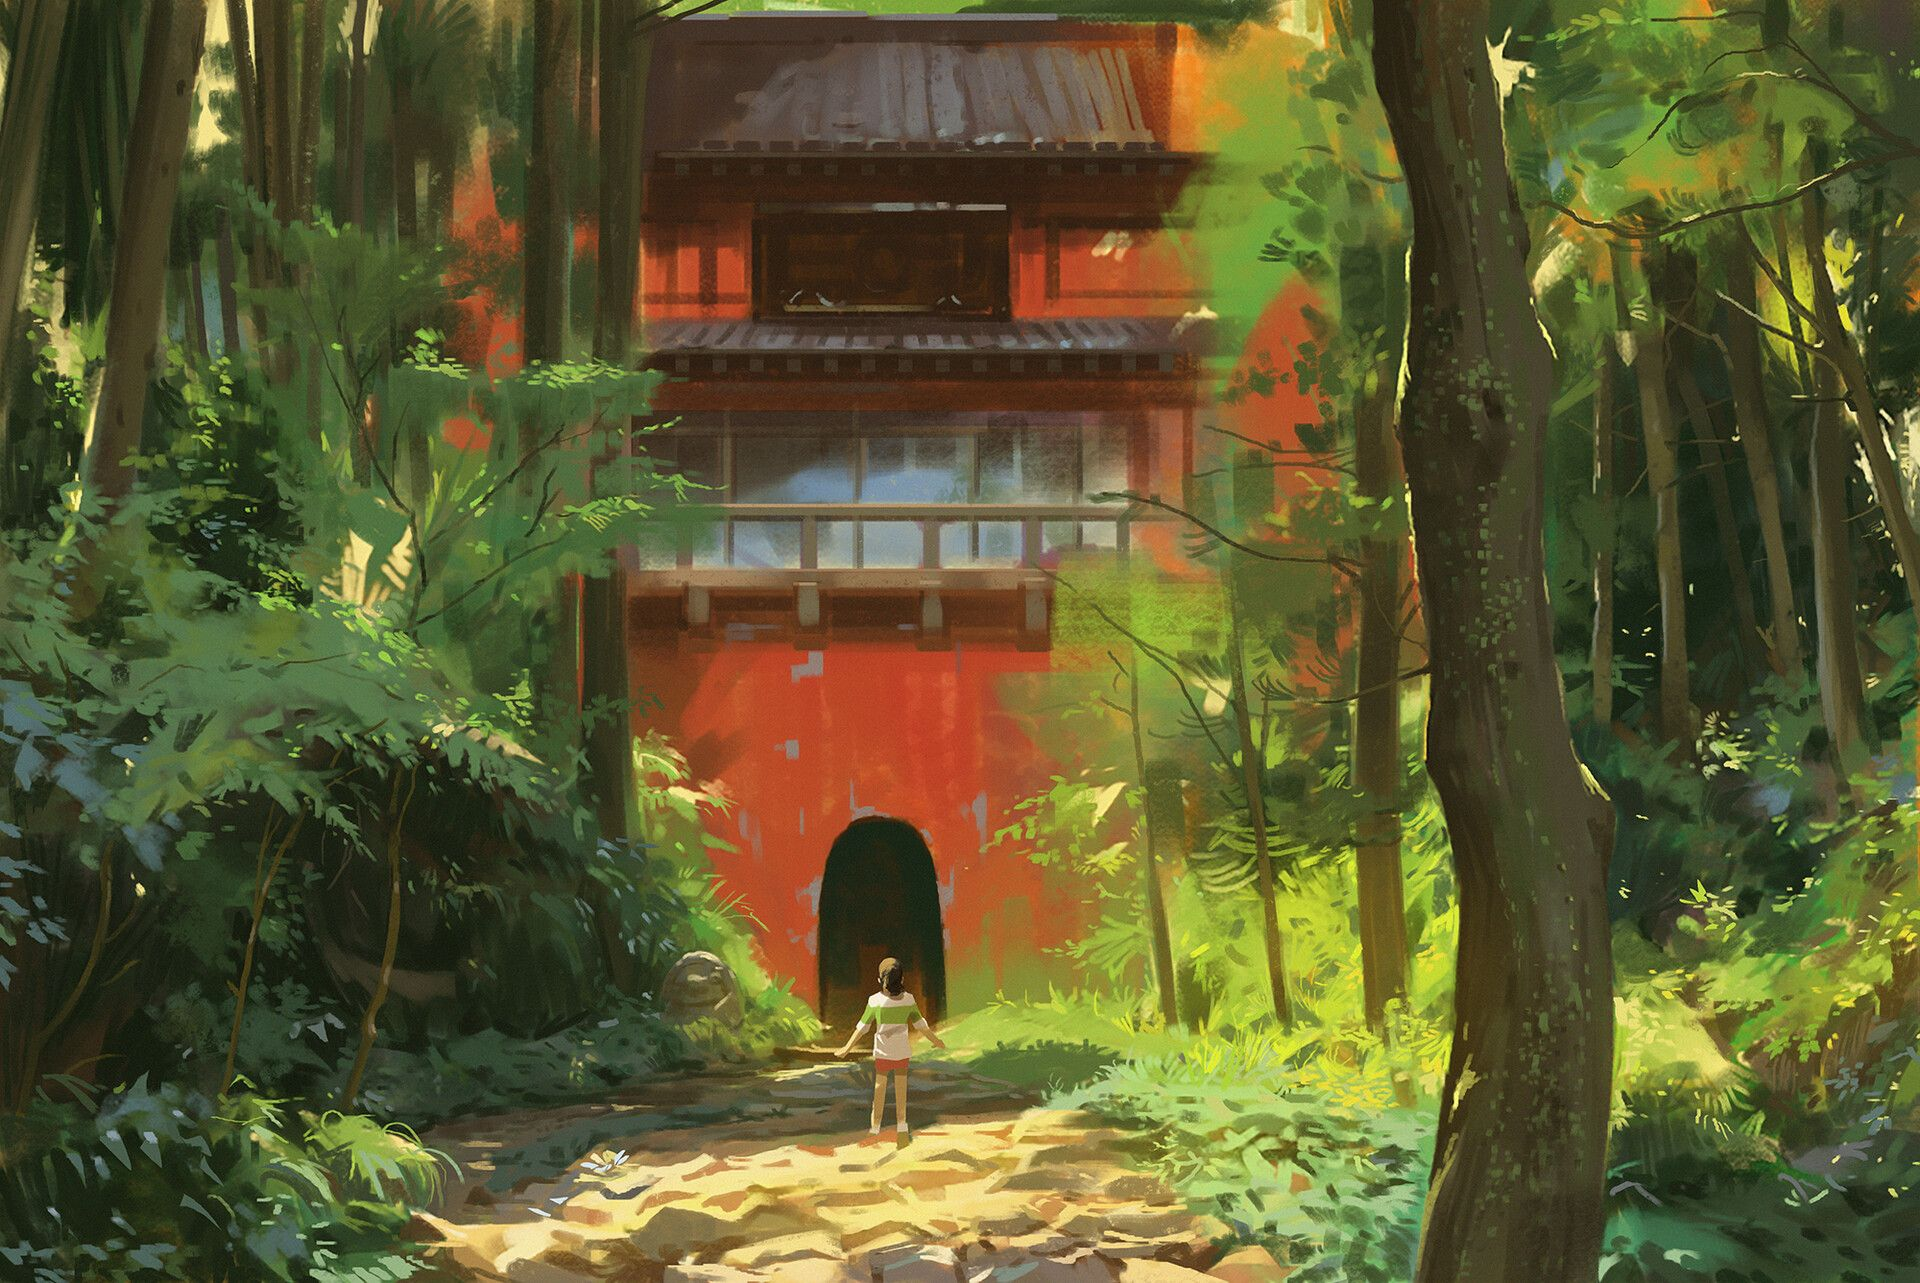 Https Www Artstation Com Artwork Z5mvpx Spirited Away Studio Ghibli Scenery